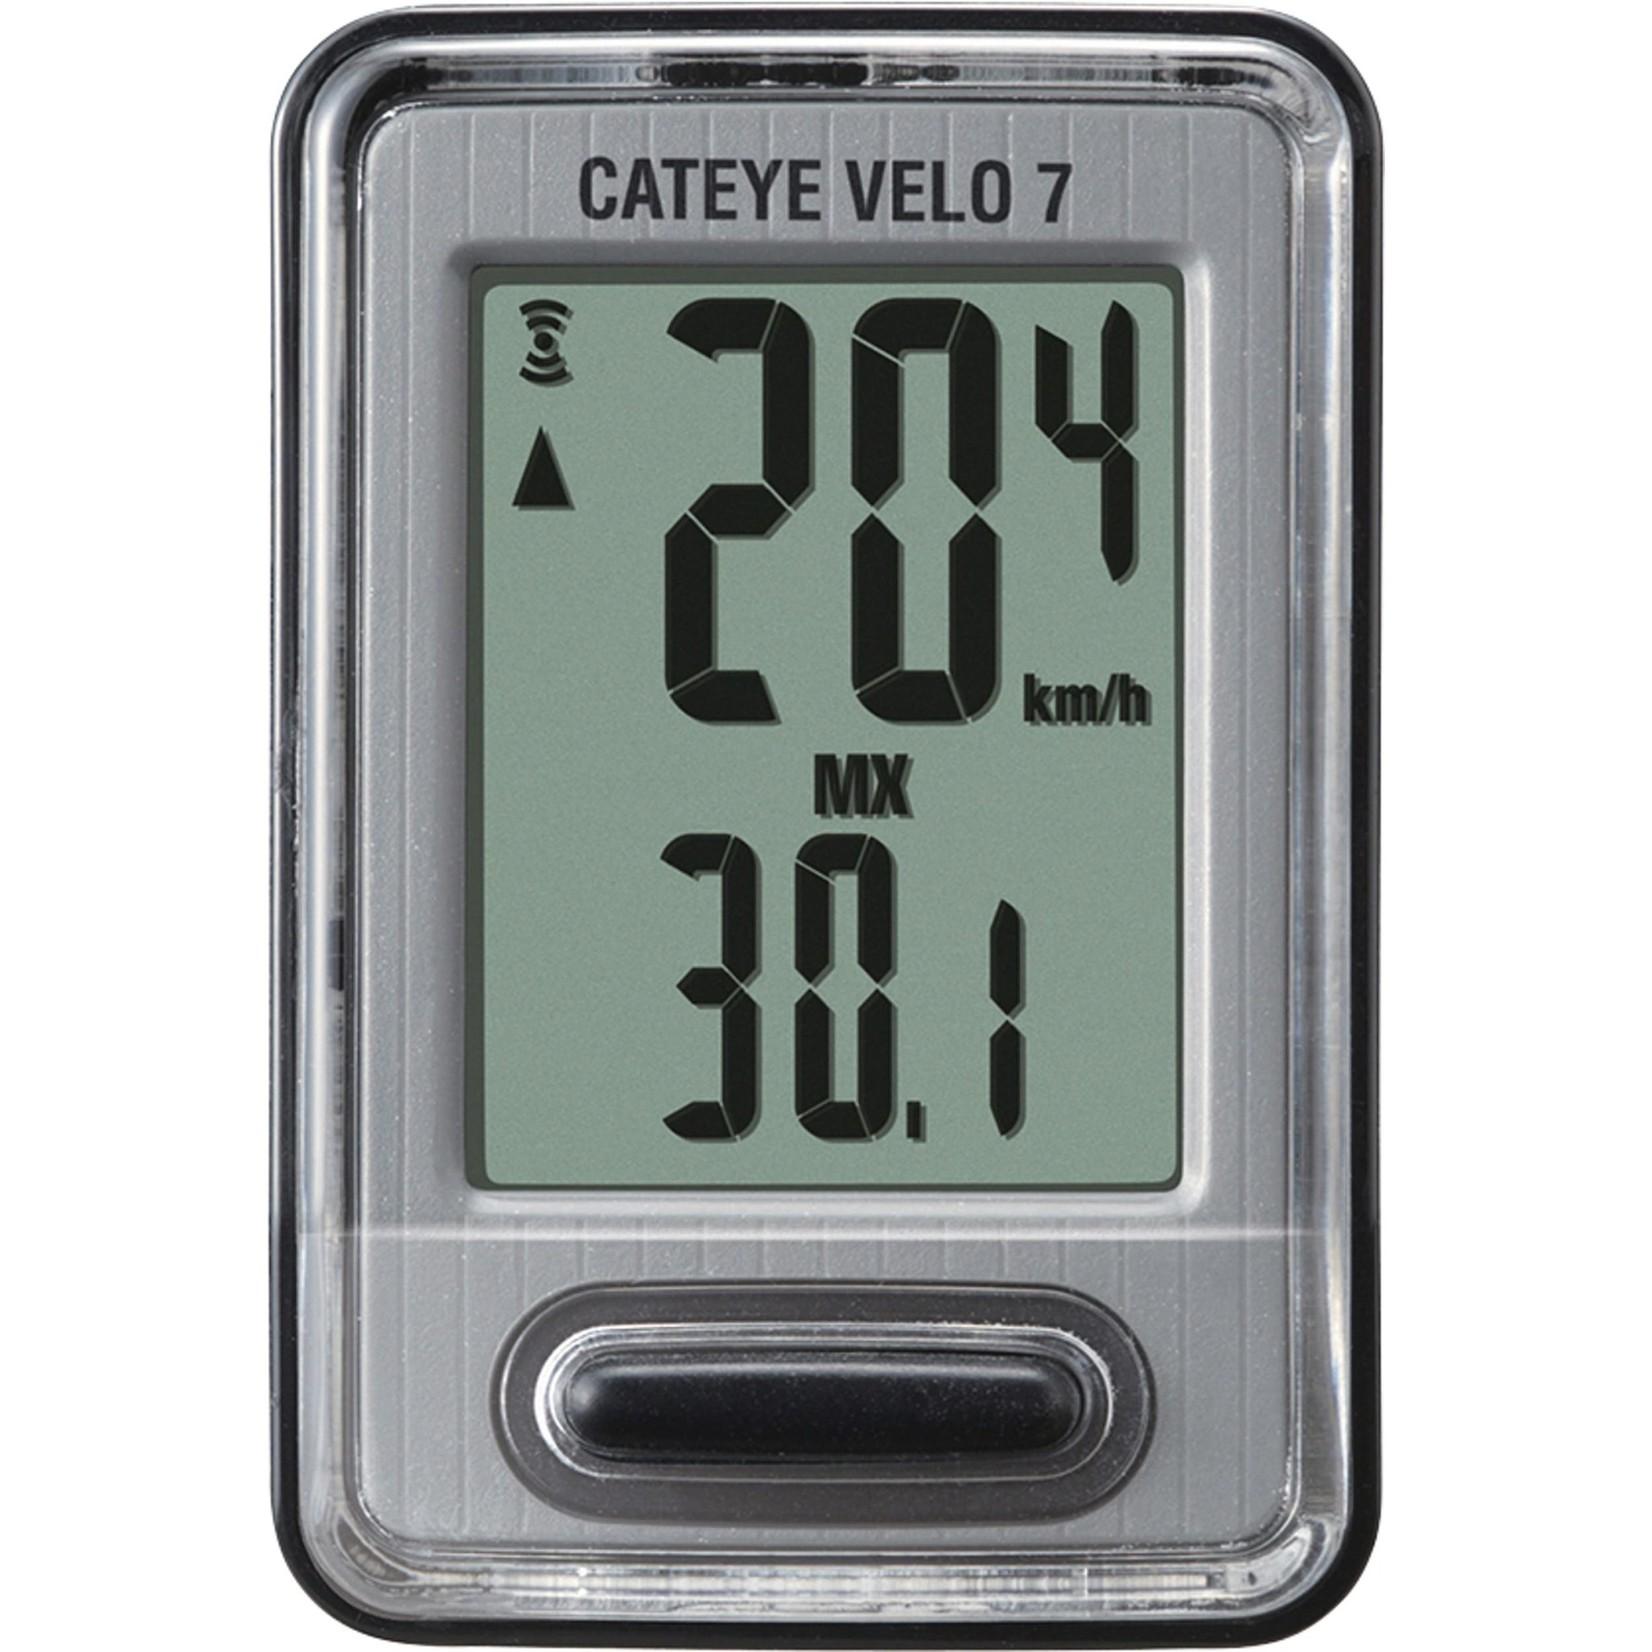 CatEye Velo 7 Cyclocomputer